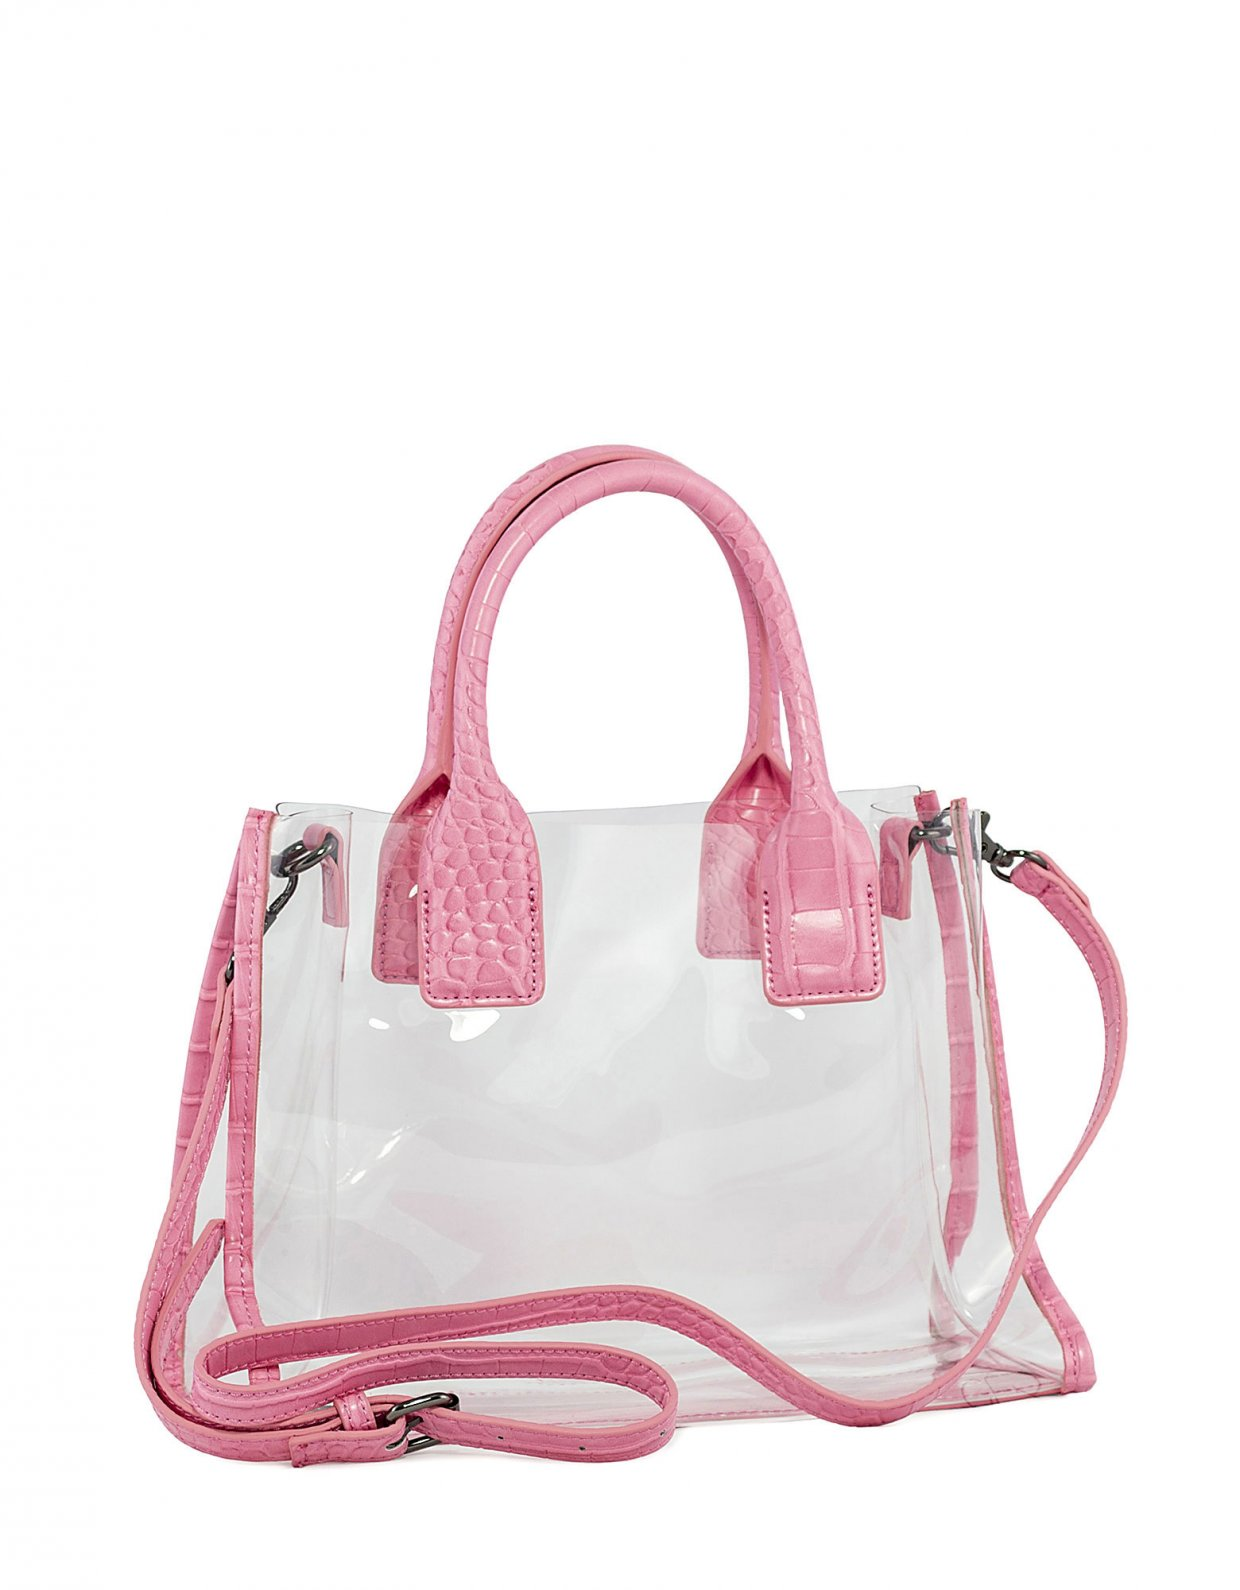 Kendall + Kylie Carla crossbody/tote bag pink croco